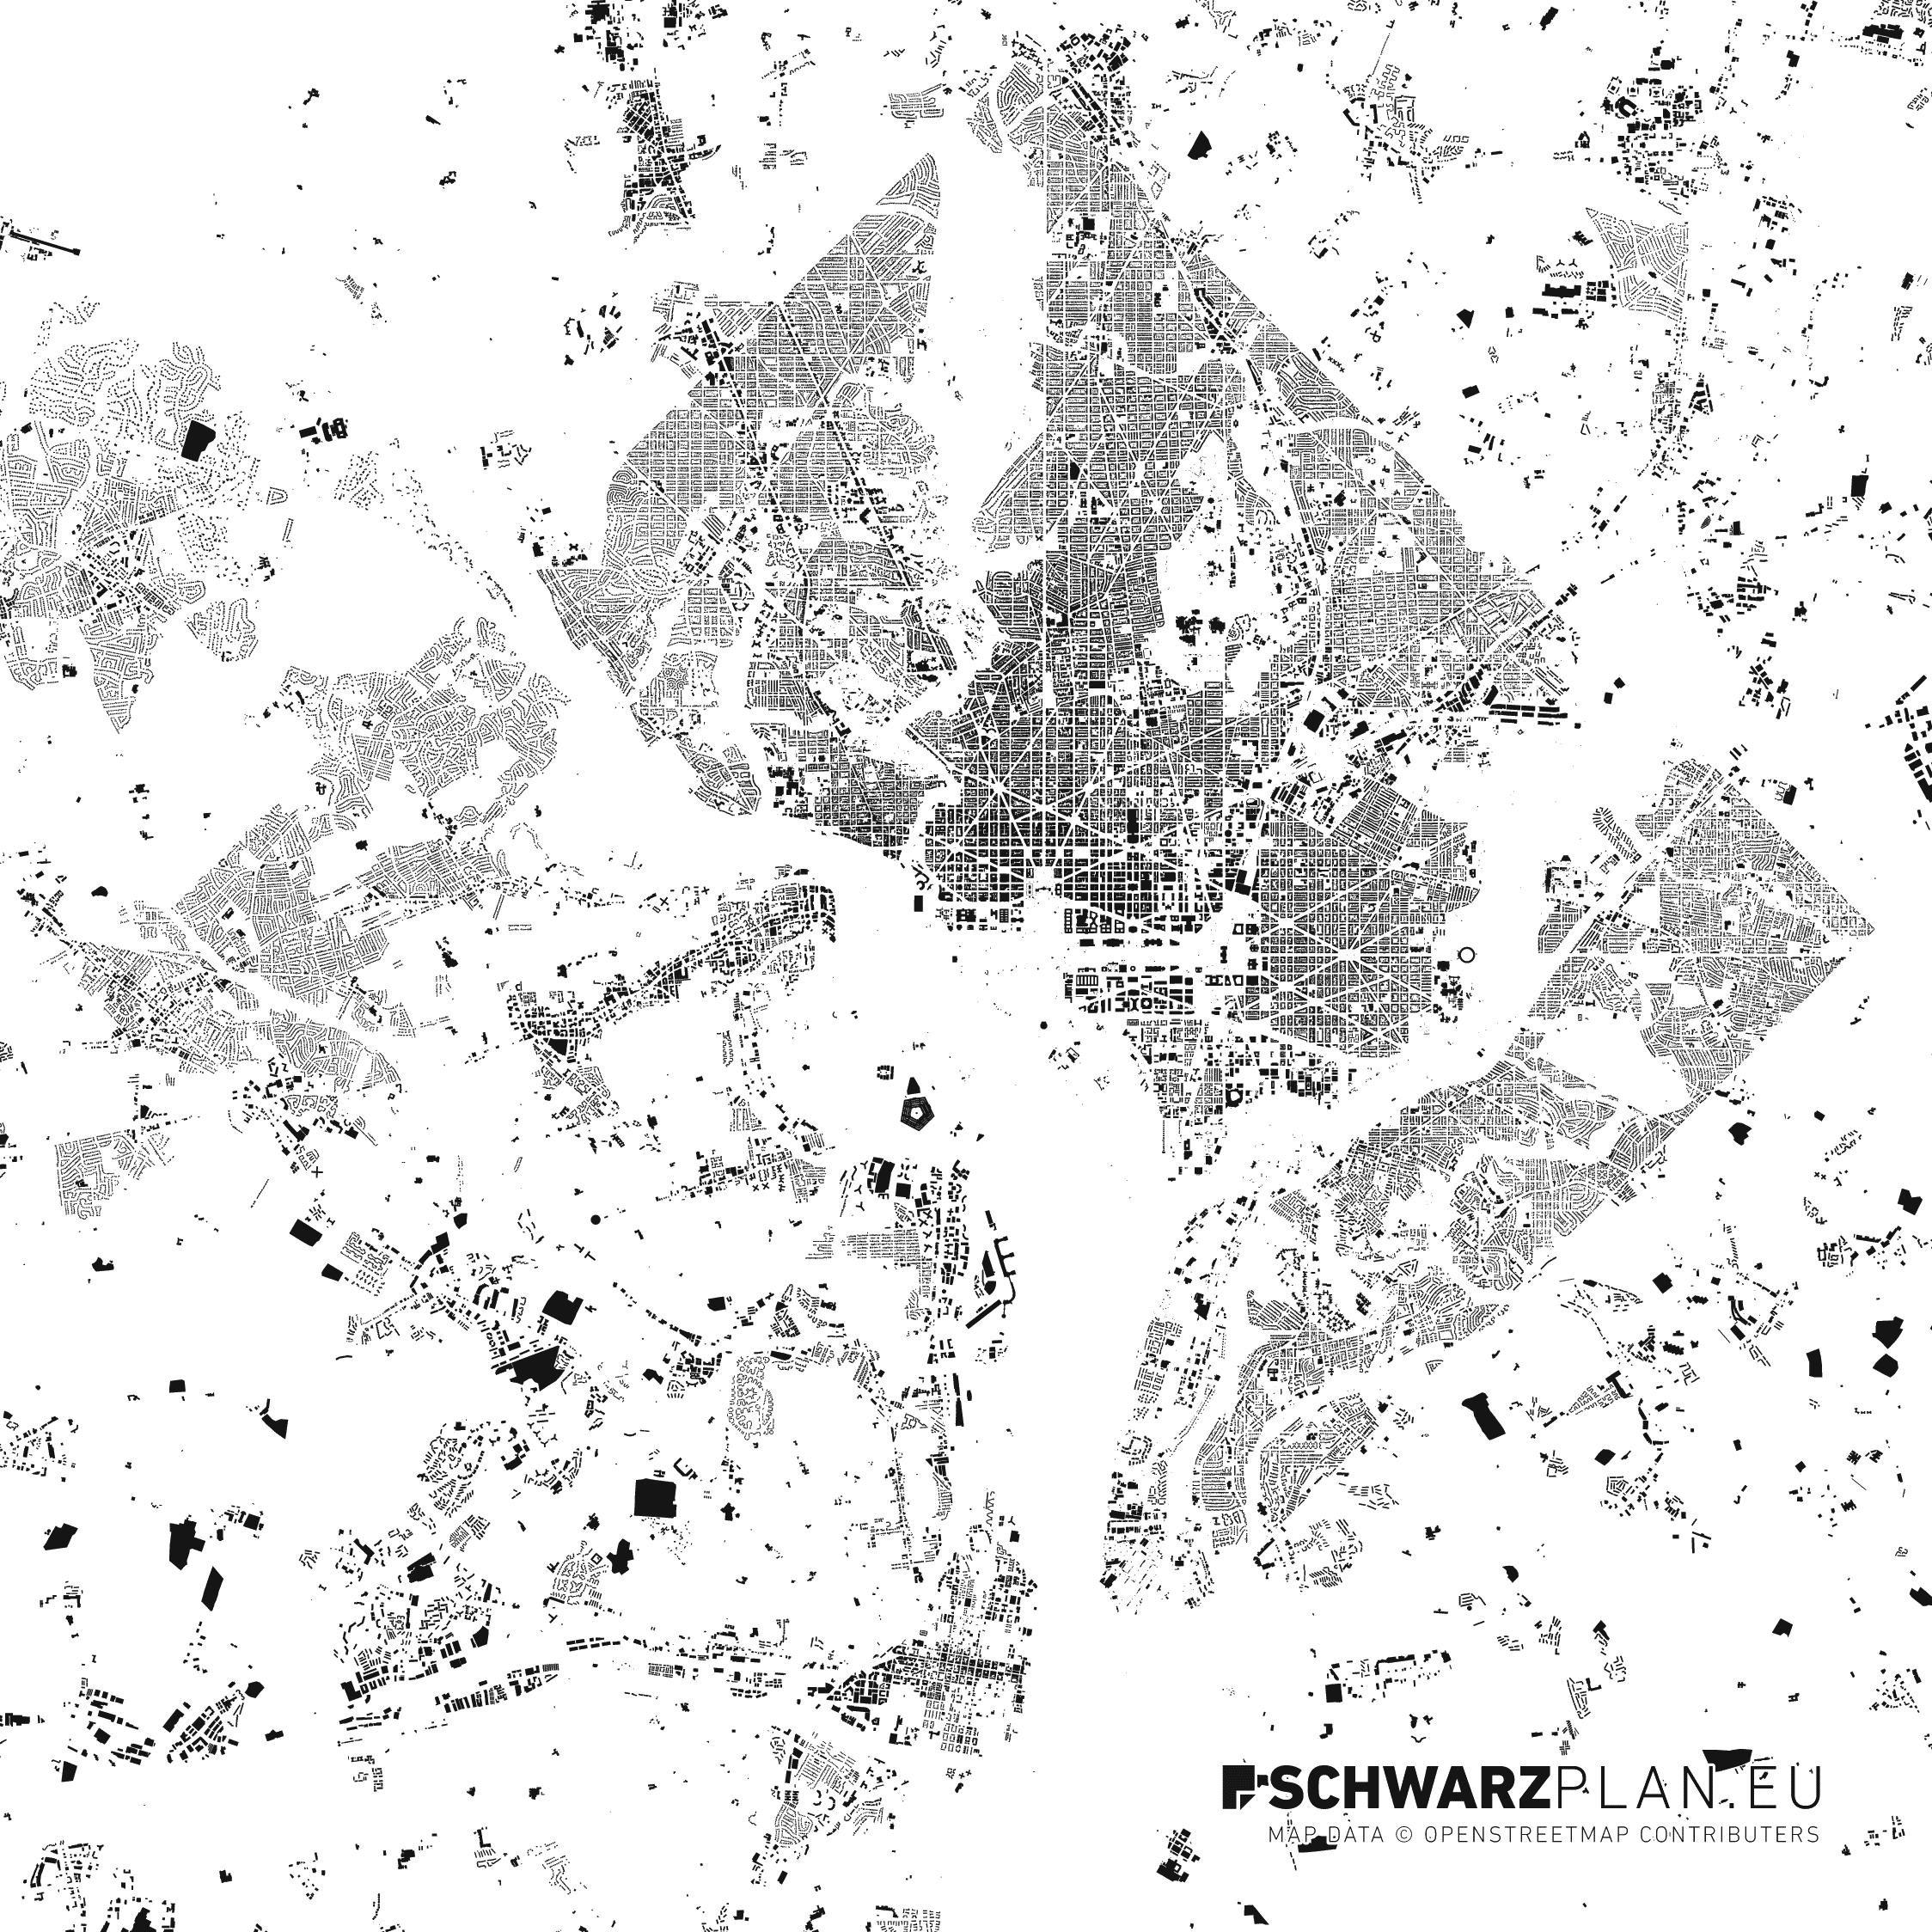 Washington Dc Map Download.Site Plan Figure Ground Plan Of Washington D C For Download As Pdf